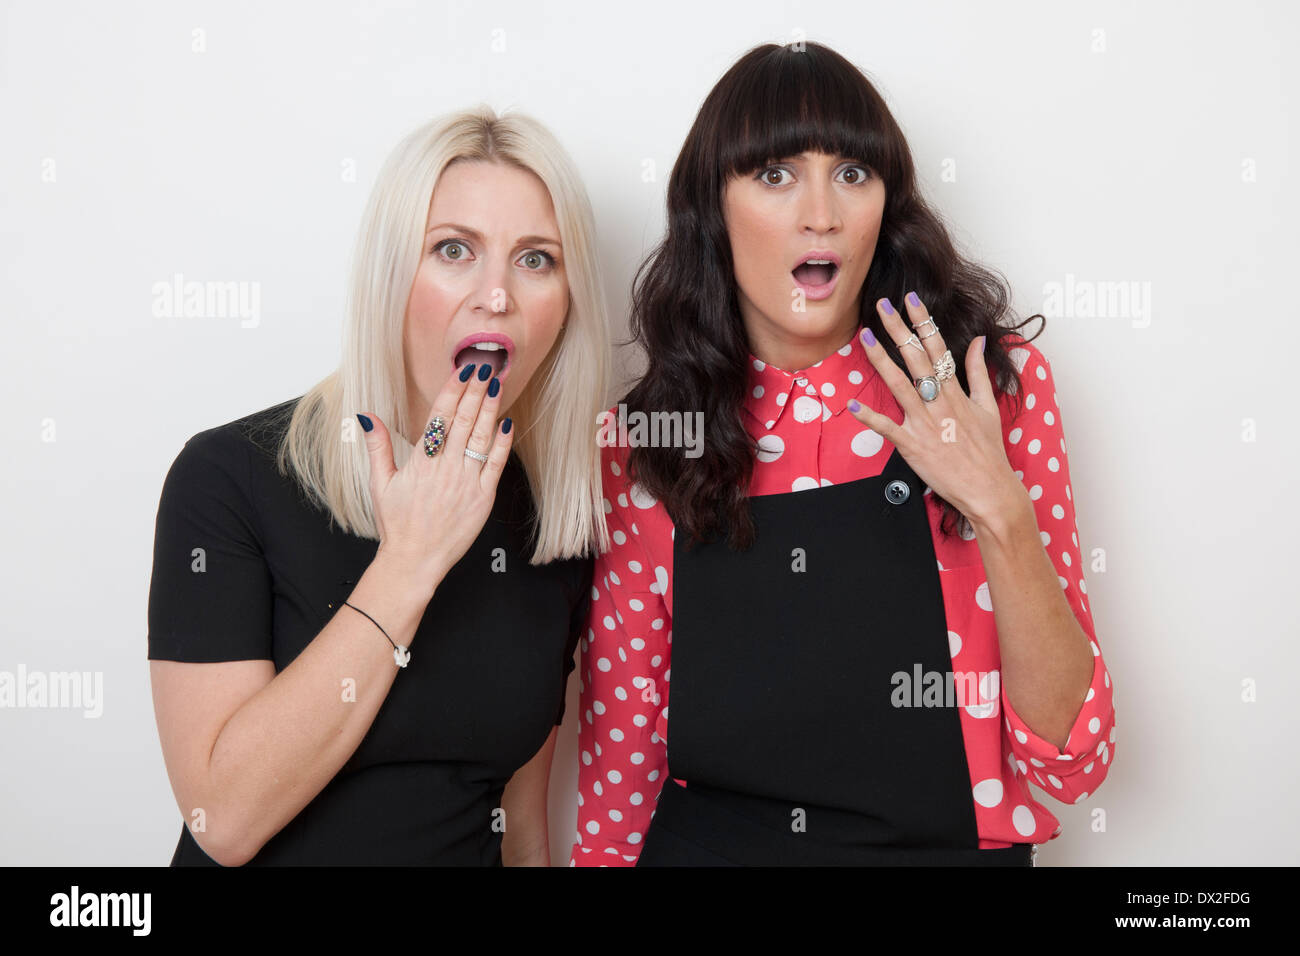 two girls shocked - Stock Image